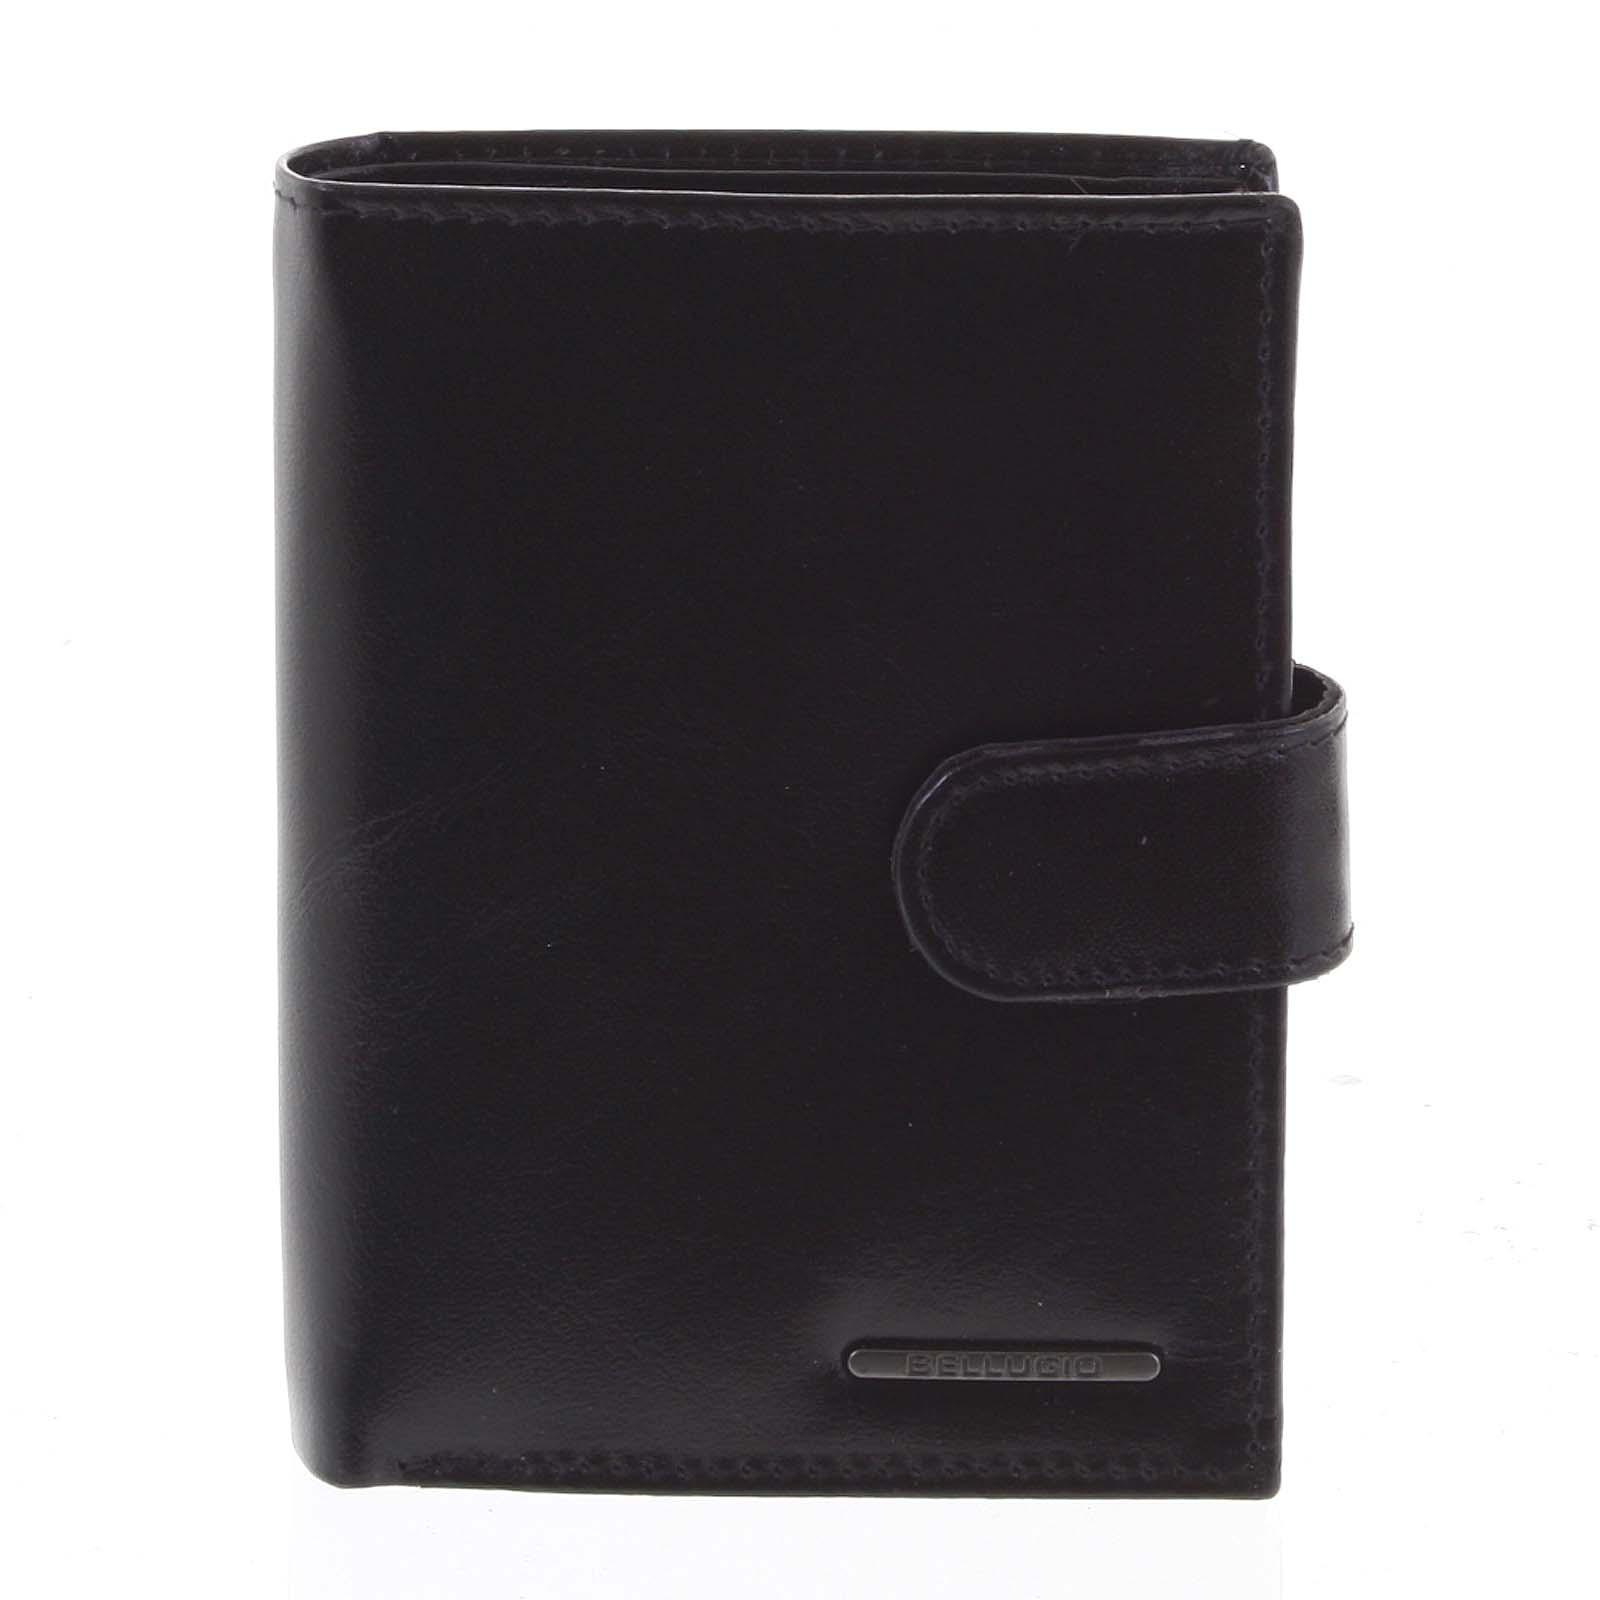 Pánská kožená peněženka černá - Bellugio Denis